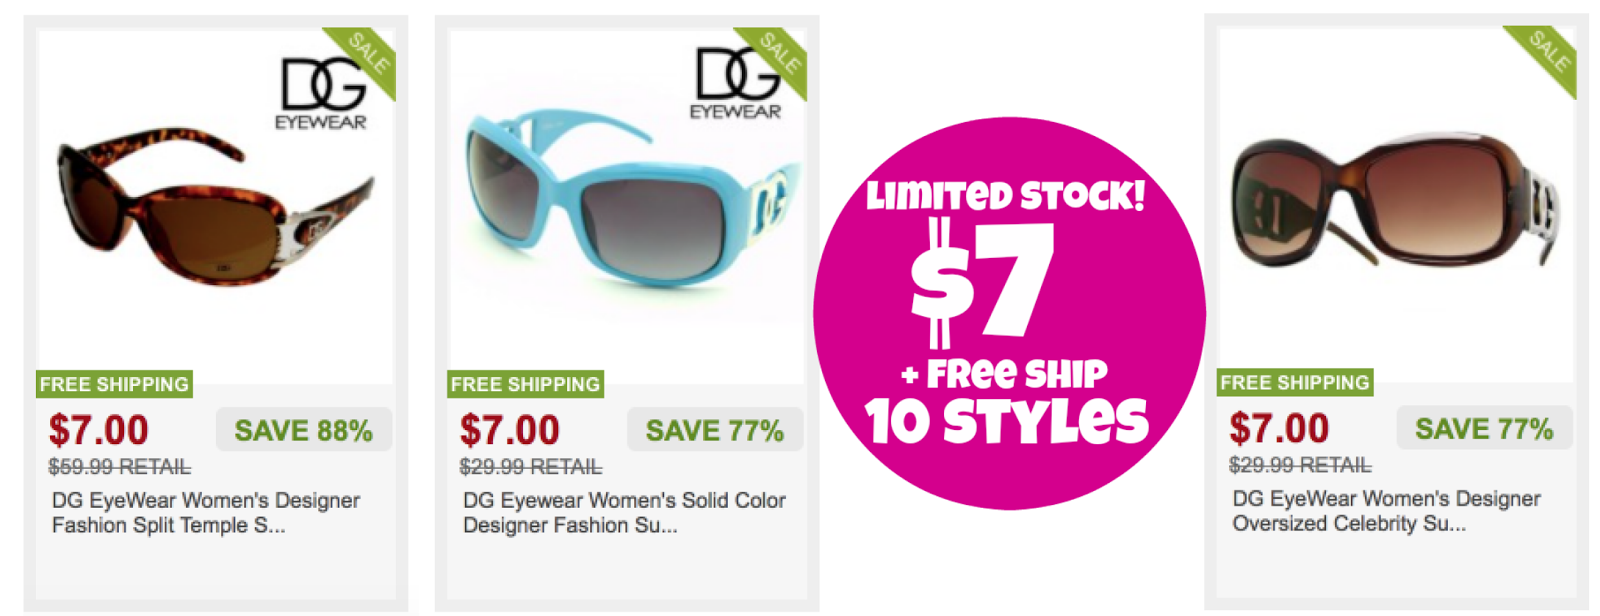 http://www.thebinderladies.com/2015/01/gearxs-dg-womens-sunglasses-7-free.html#.VLf-ZofduyM